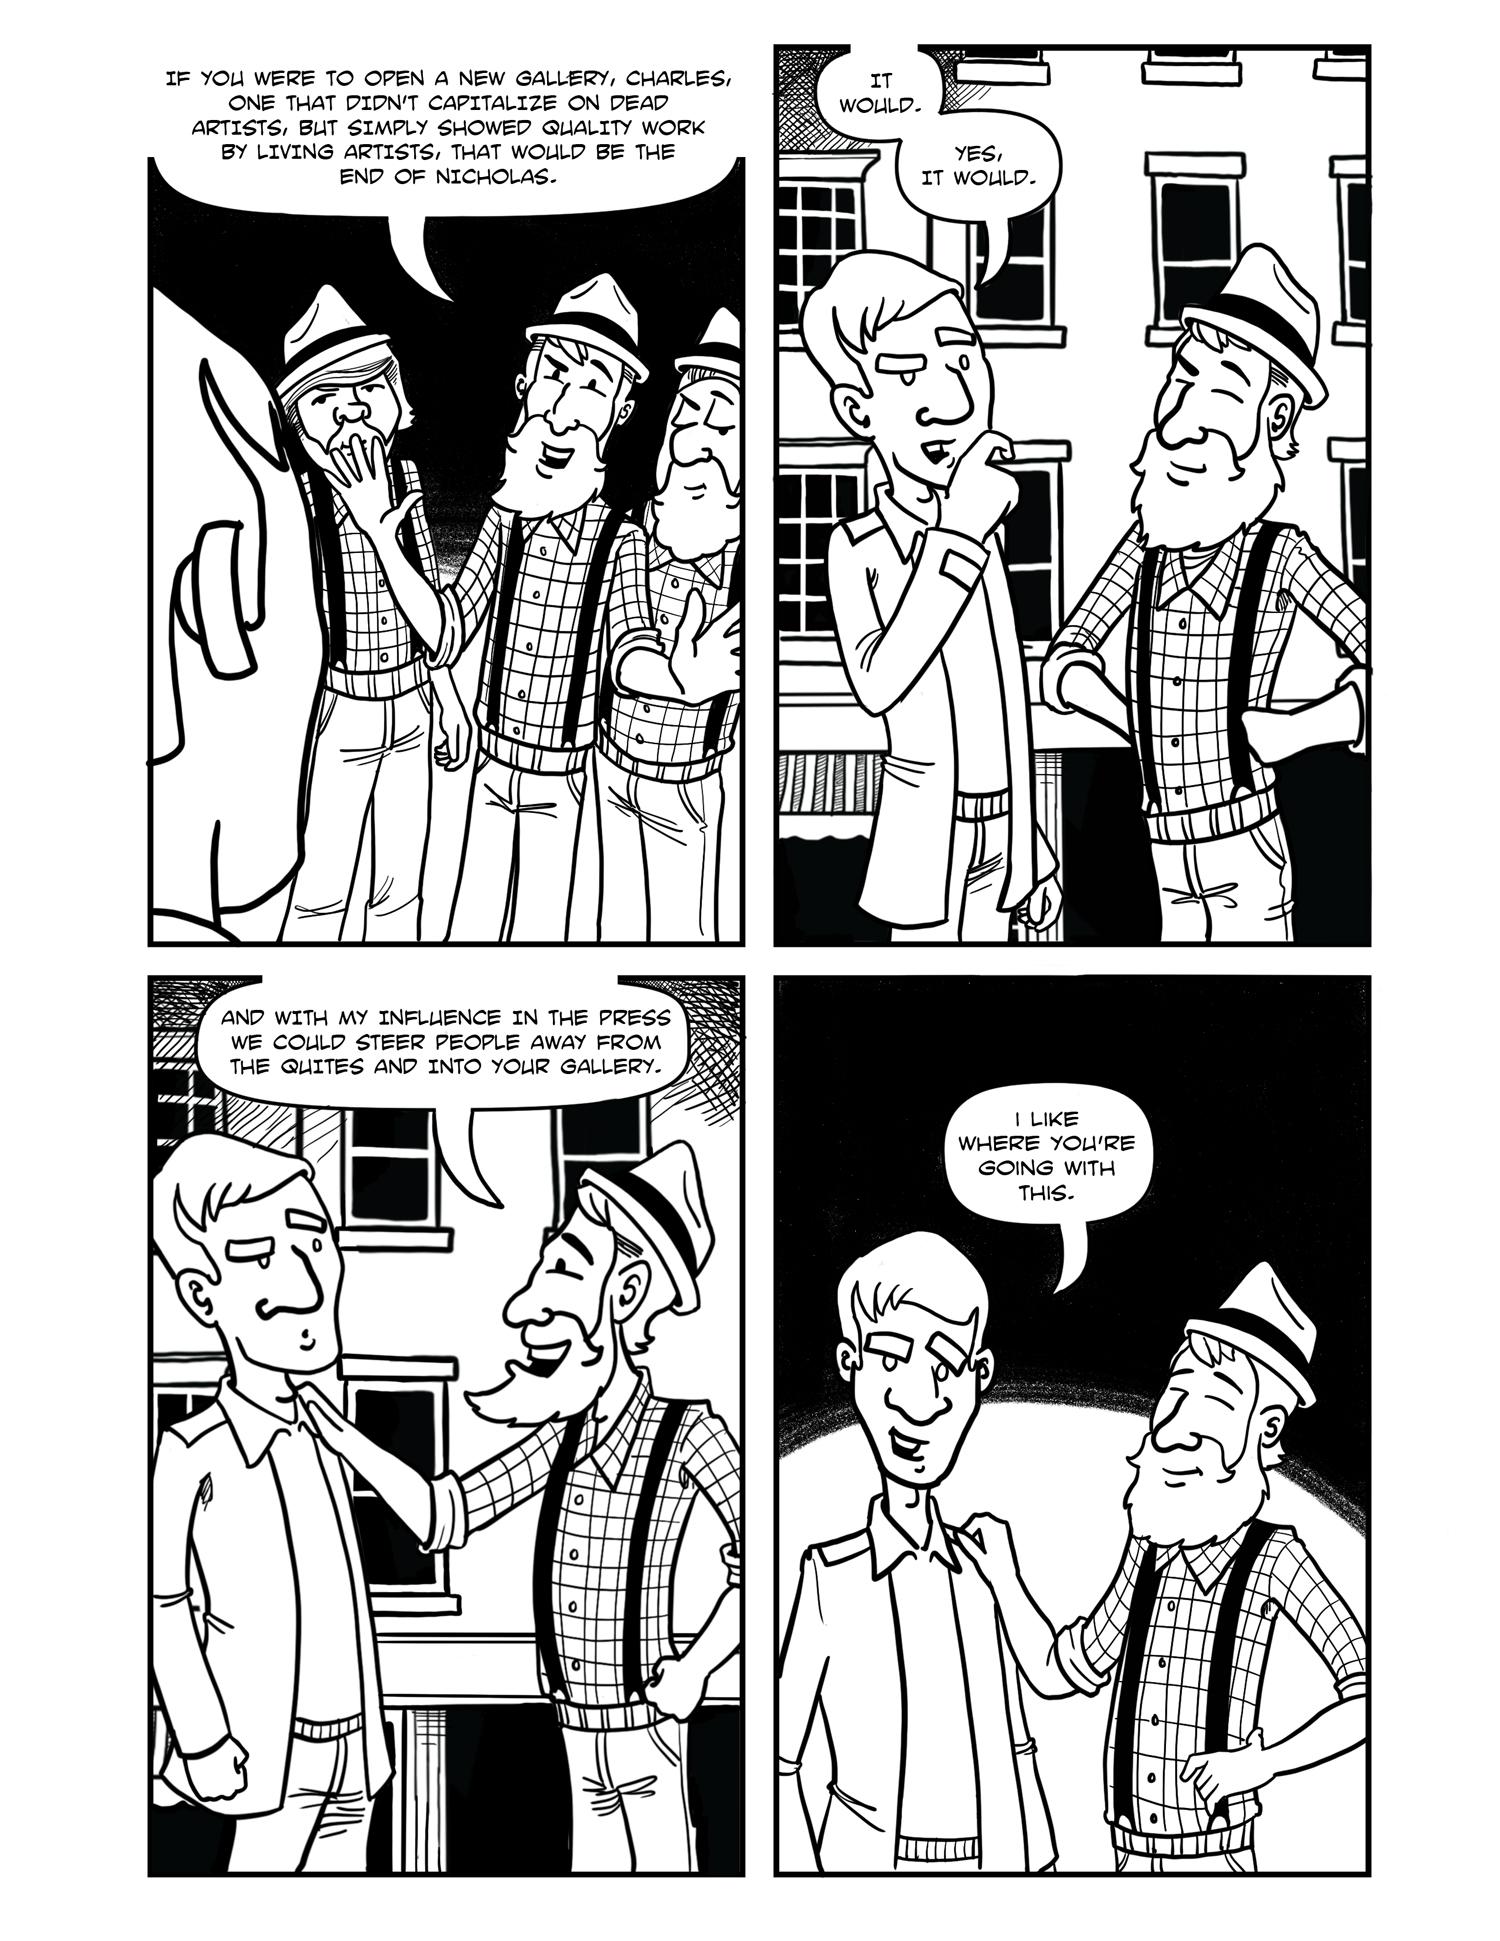 PAGE-161.jpg